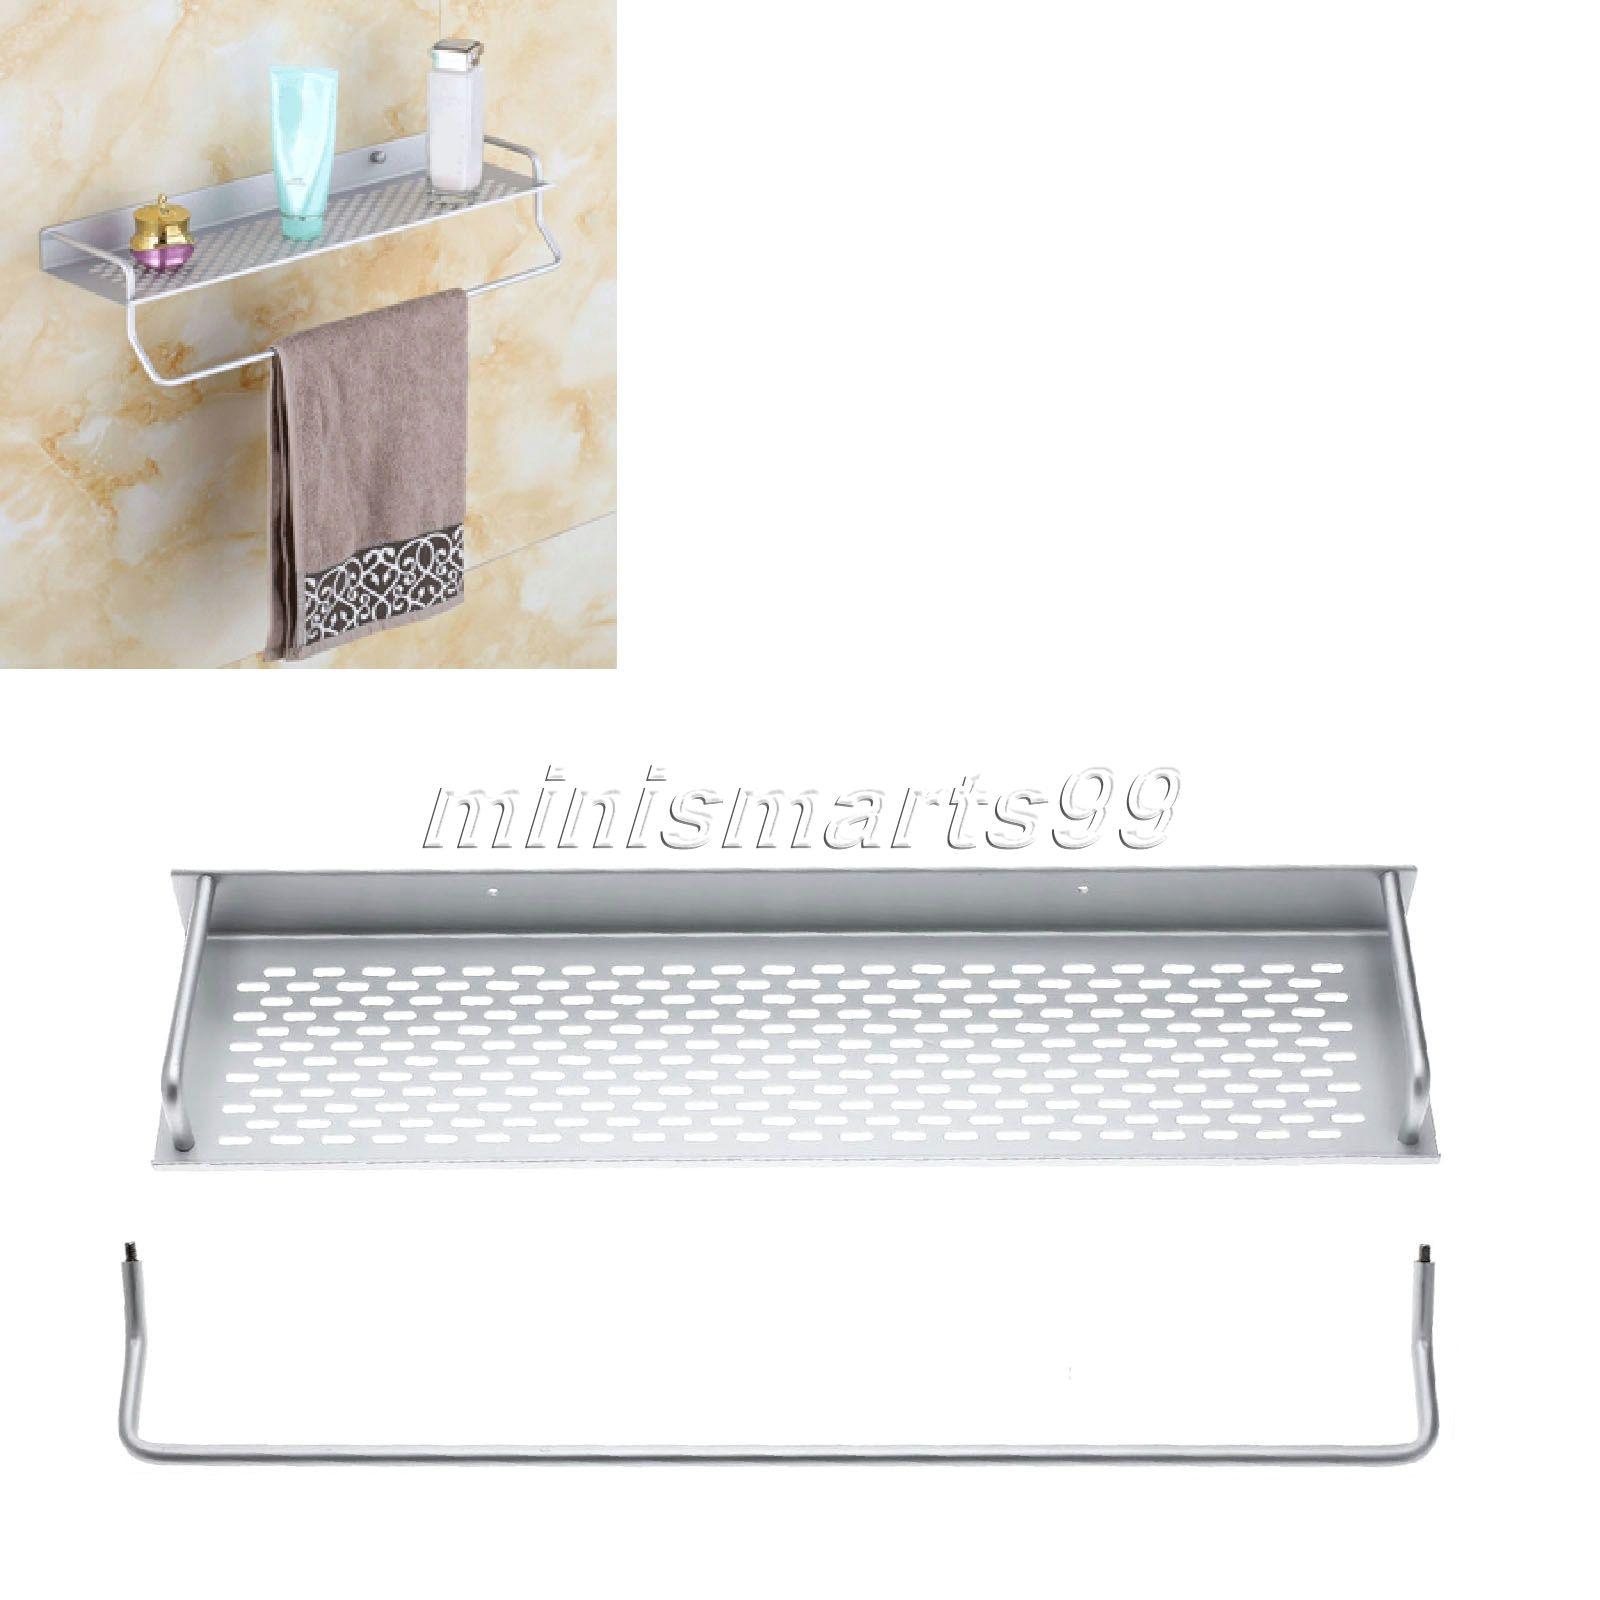 Kitchen Towel Bars Online Get Cheap Kitchen Towel Bar Aliexpresscom Alibaba Group